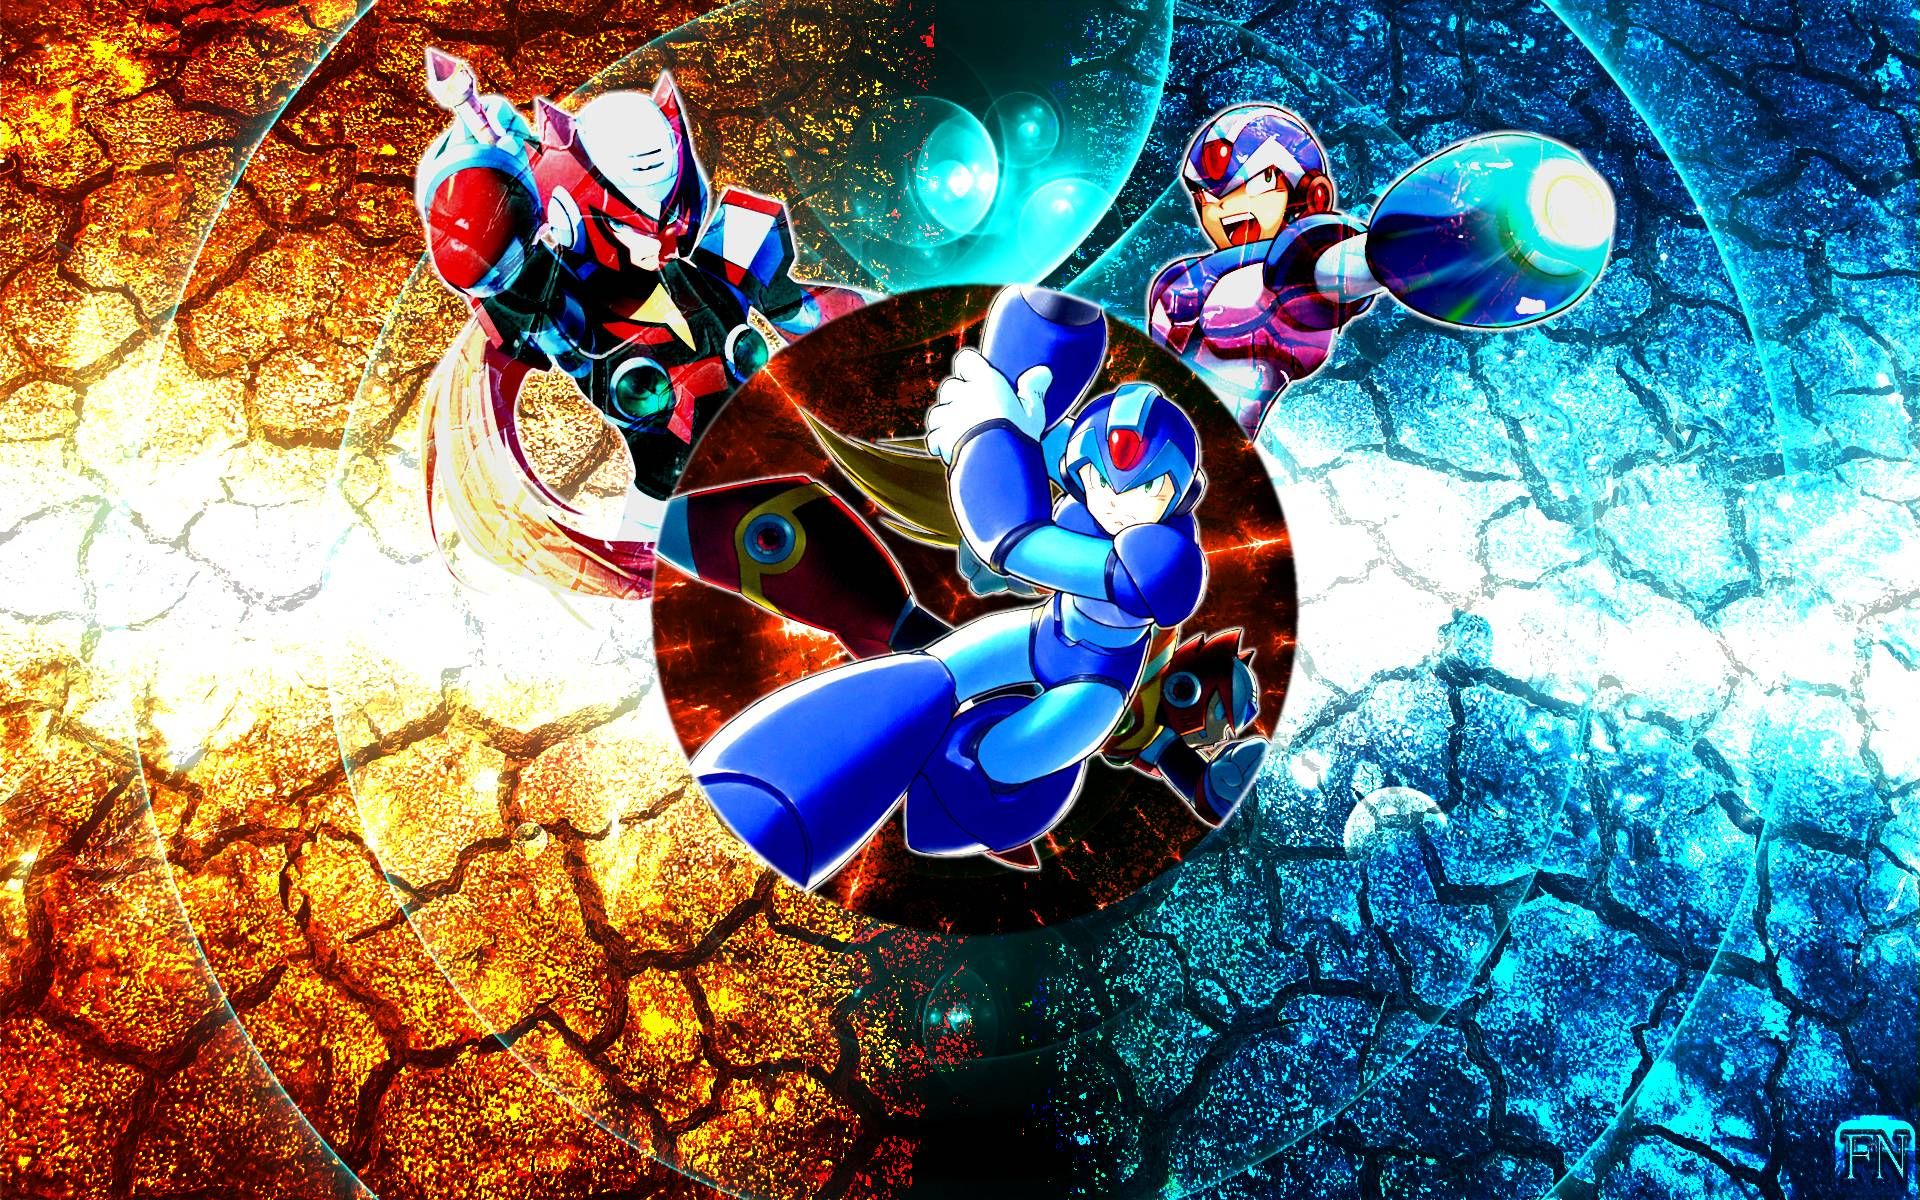 Zero Megaman X Wallpaper Zerochan Anime Image Board Wallpaper Anime Images Abstract Artwork